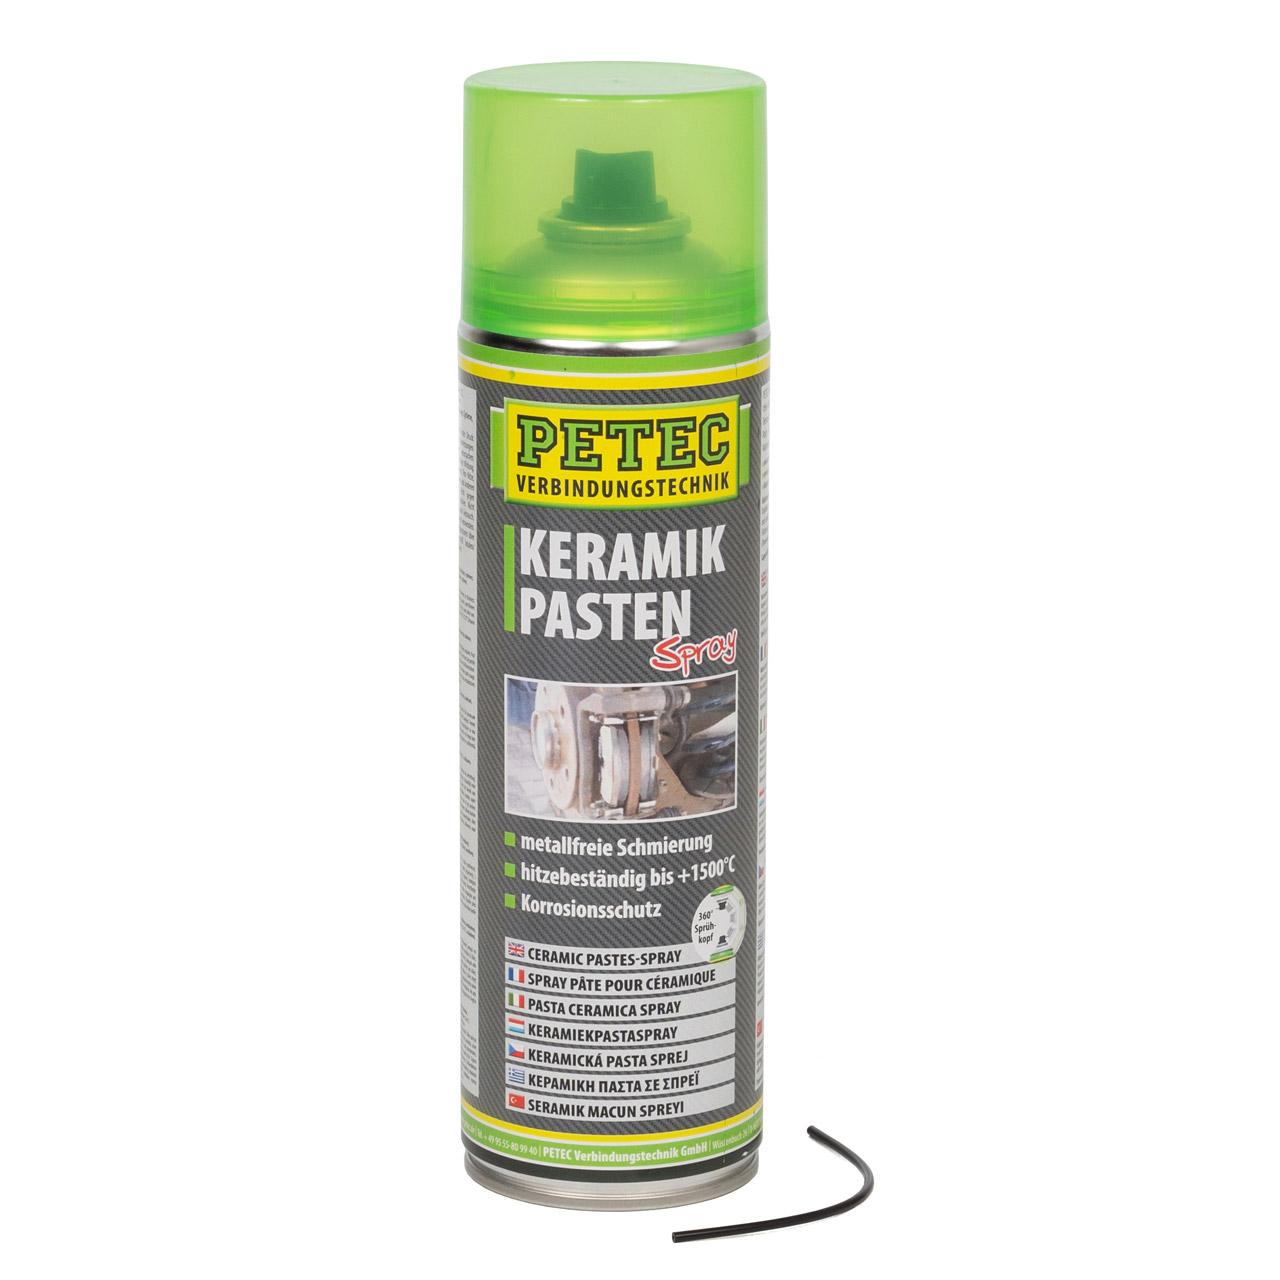 PETEC 70650 Keramikpastenspray Keramikpasten Spray Ceramic bis +1500°C 500ml